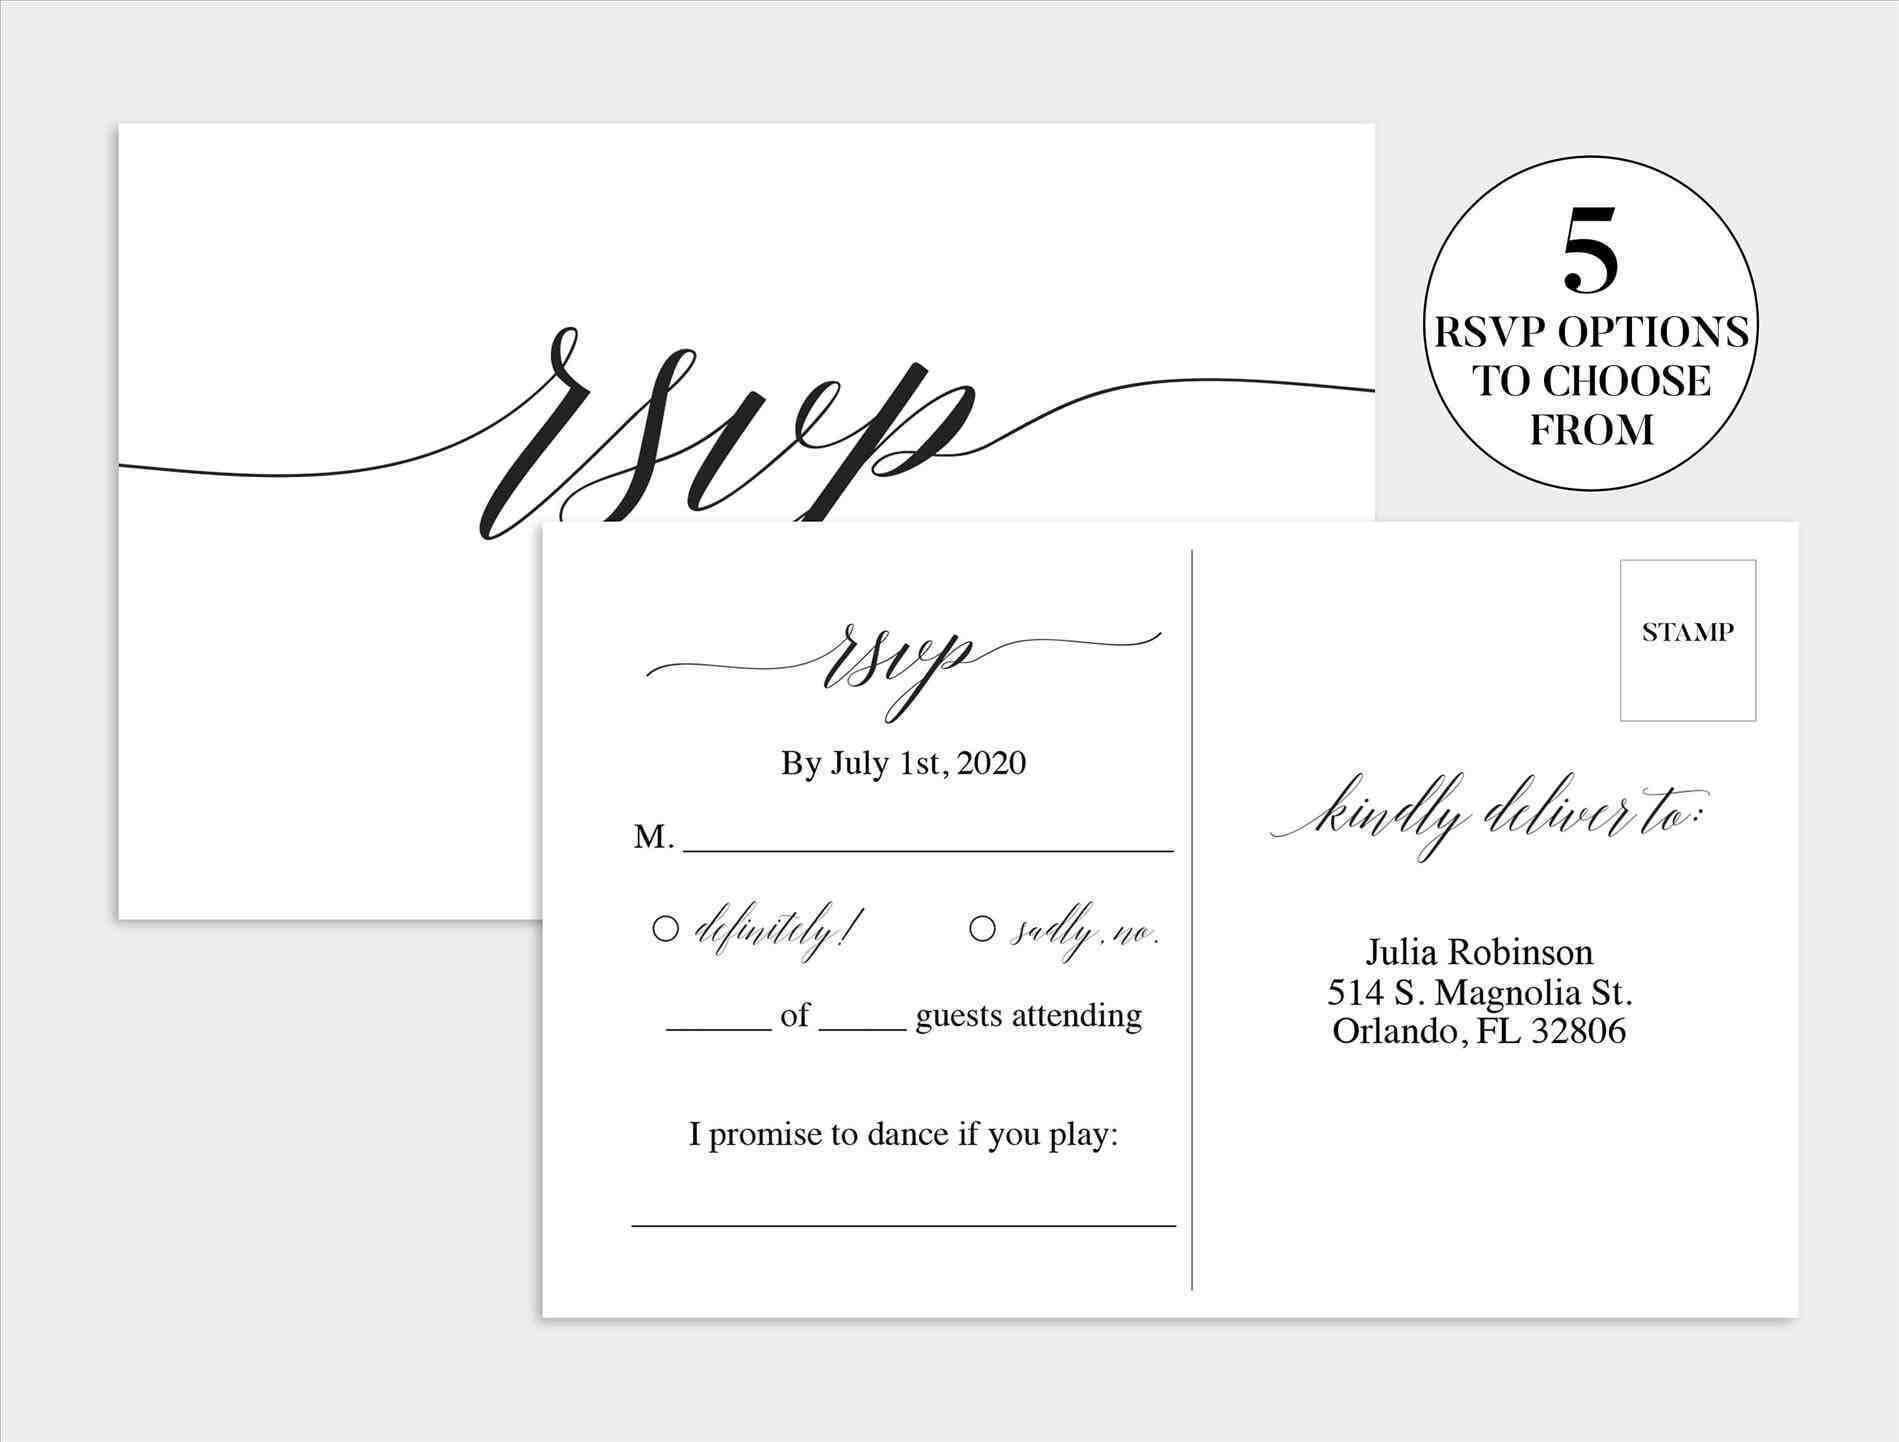 Pinjoanna Keysa On Free Tamplate   Wedding Reply Cards Pertaining To Free Printable Wedding Rsvp Card Templates